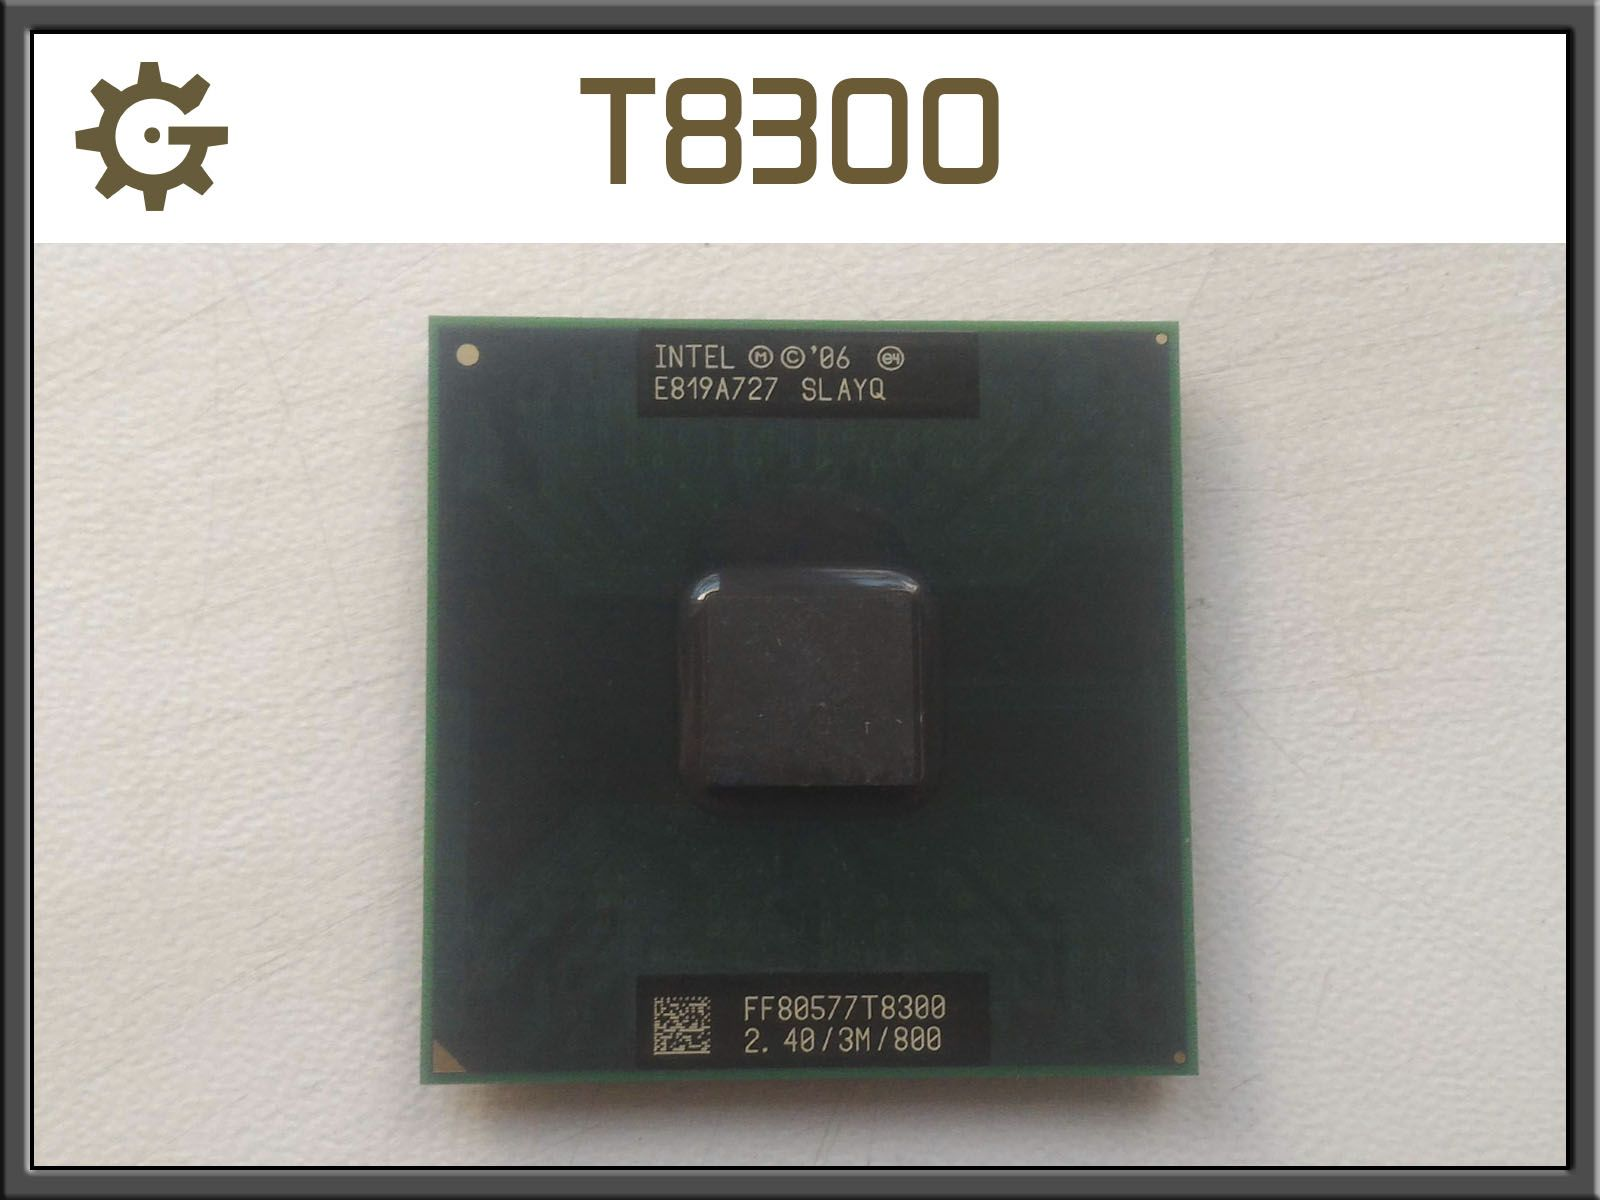 Процессор T8300 ноутбук Intel Core 2 Duo 2,4Ghz GL40 Socket P +т/паста